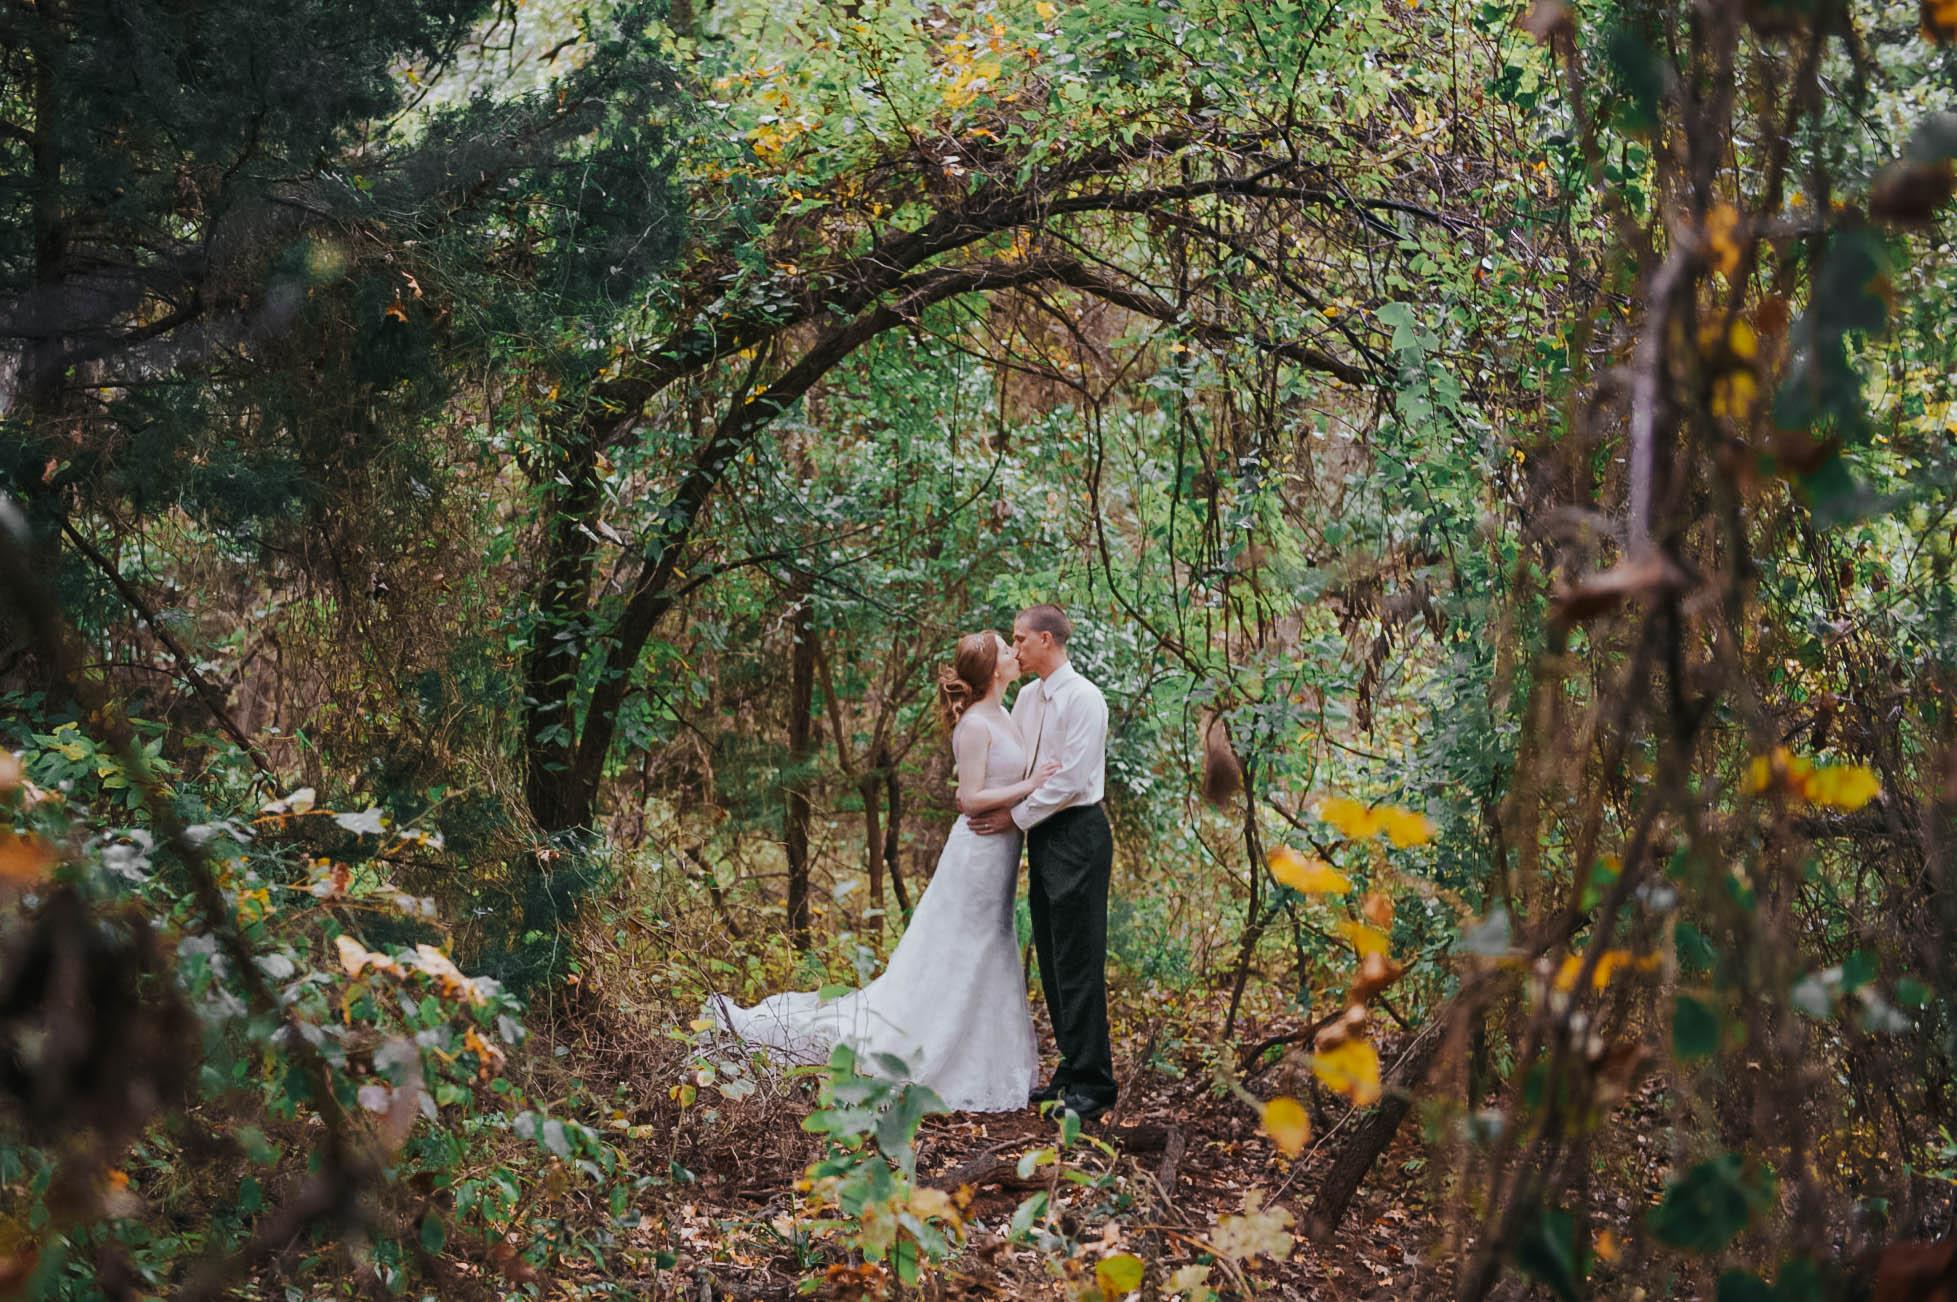 Whidbey-Island-Wedding-Photographer-J-Hodges (1 of 1)-8.jpg